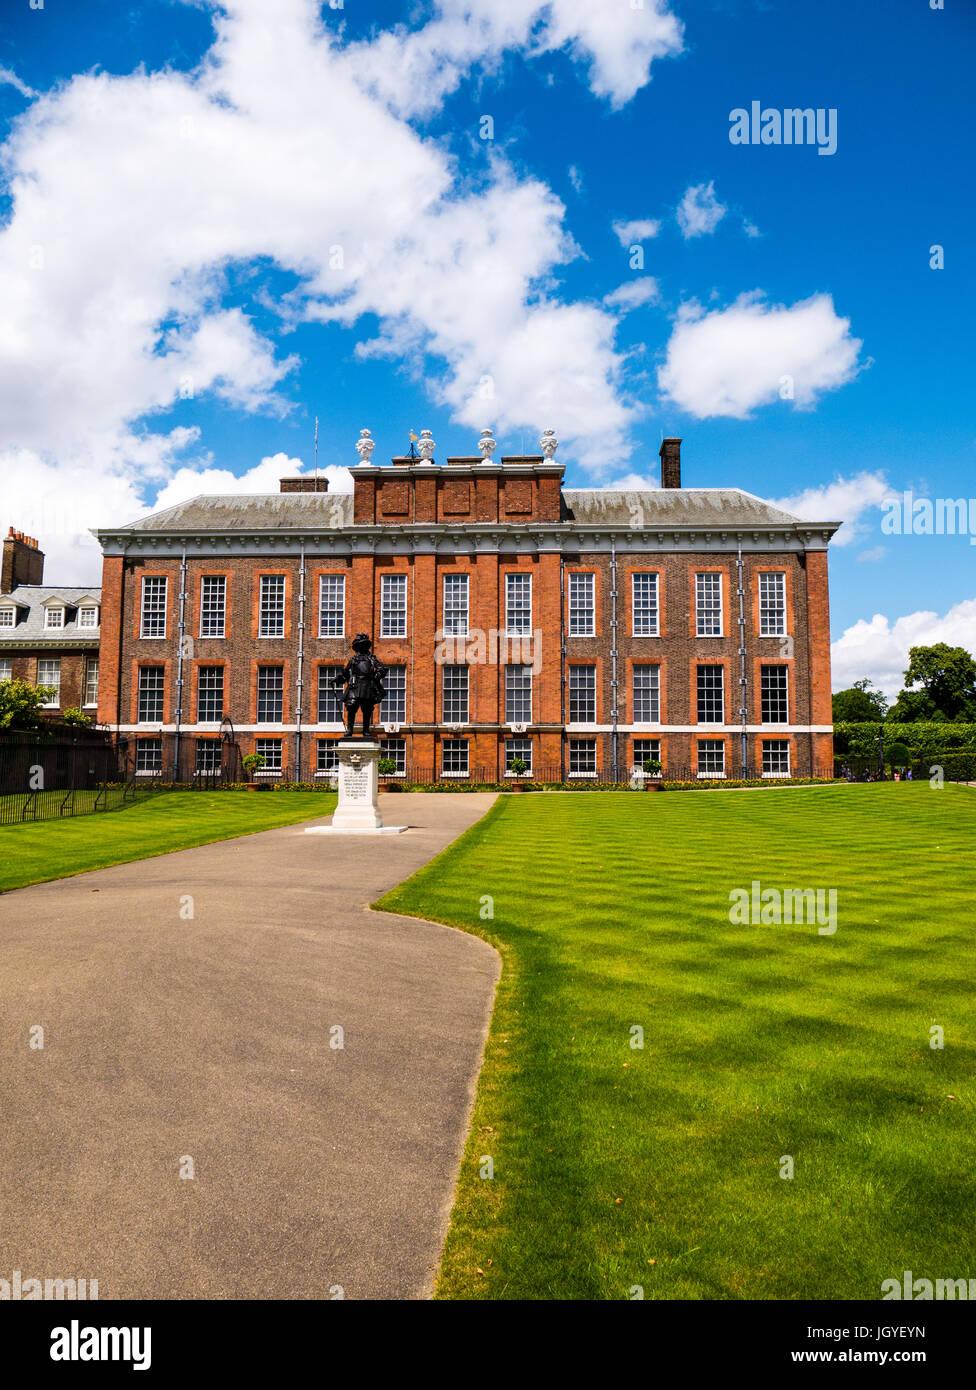 Kensington Palace, Kensington Gardens, London, England - Stock Image